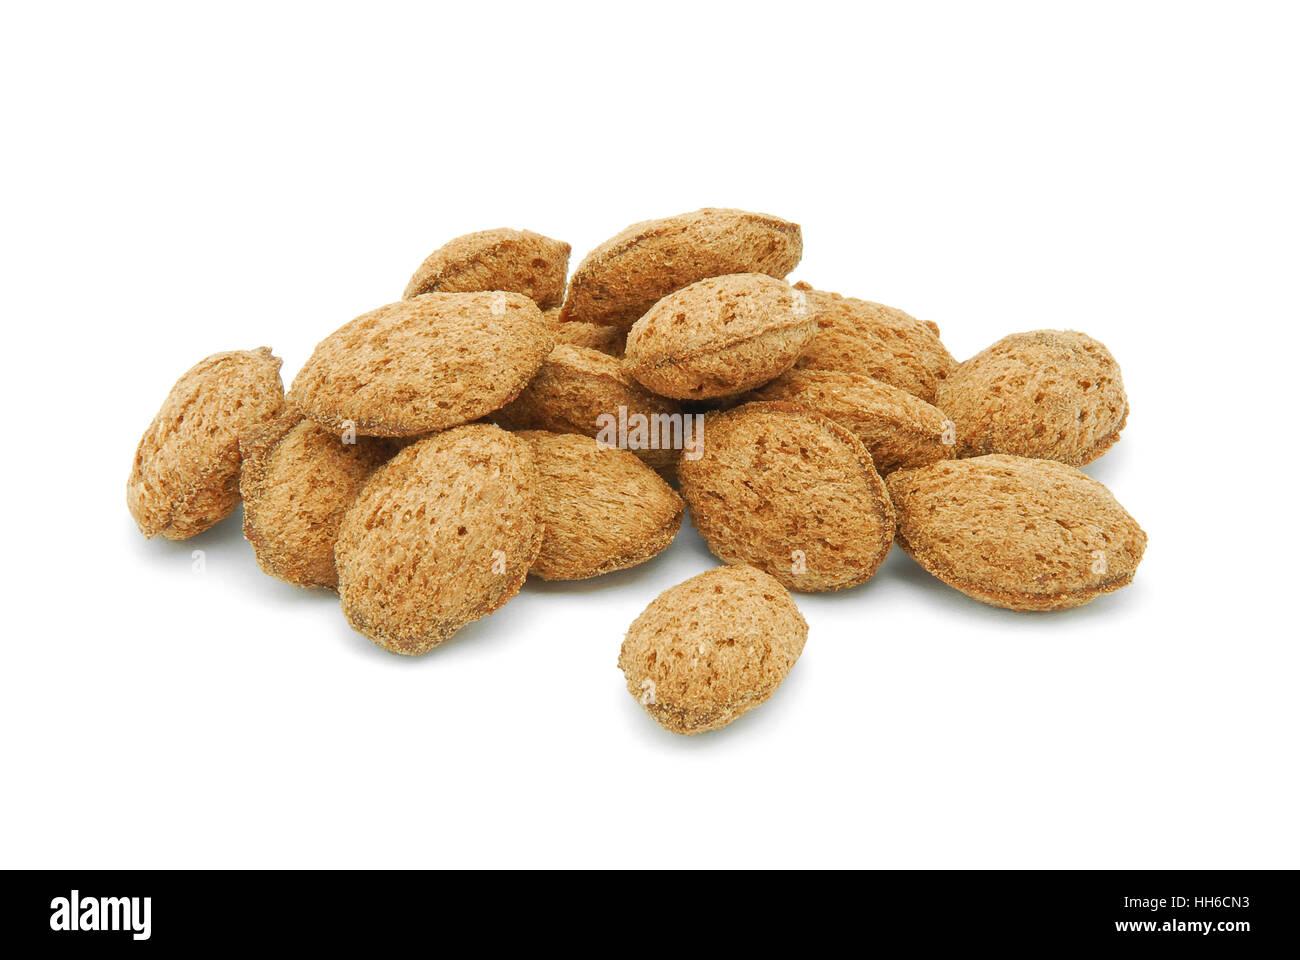 cocoa chocolate snacks - Stock Image